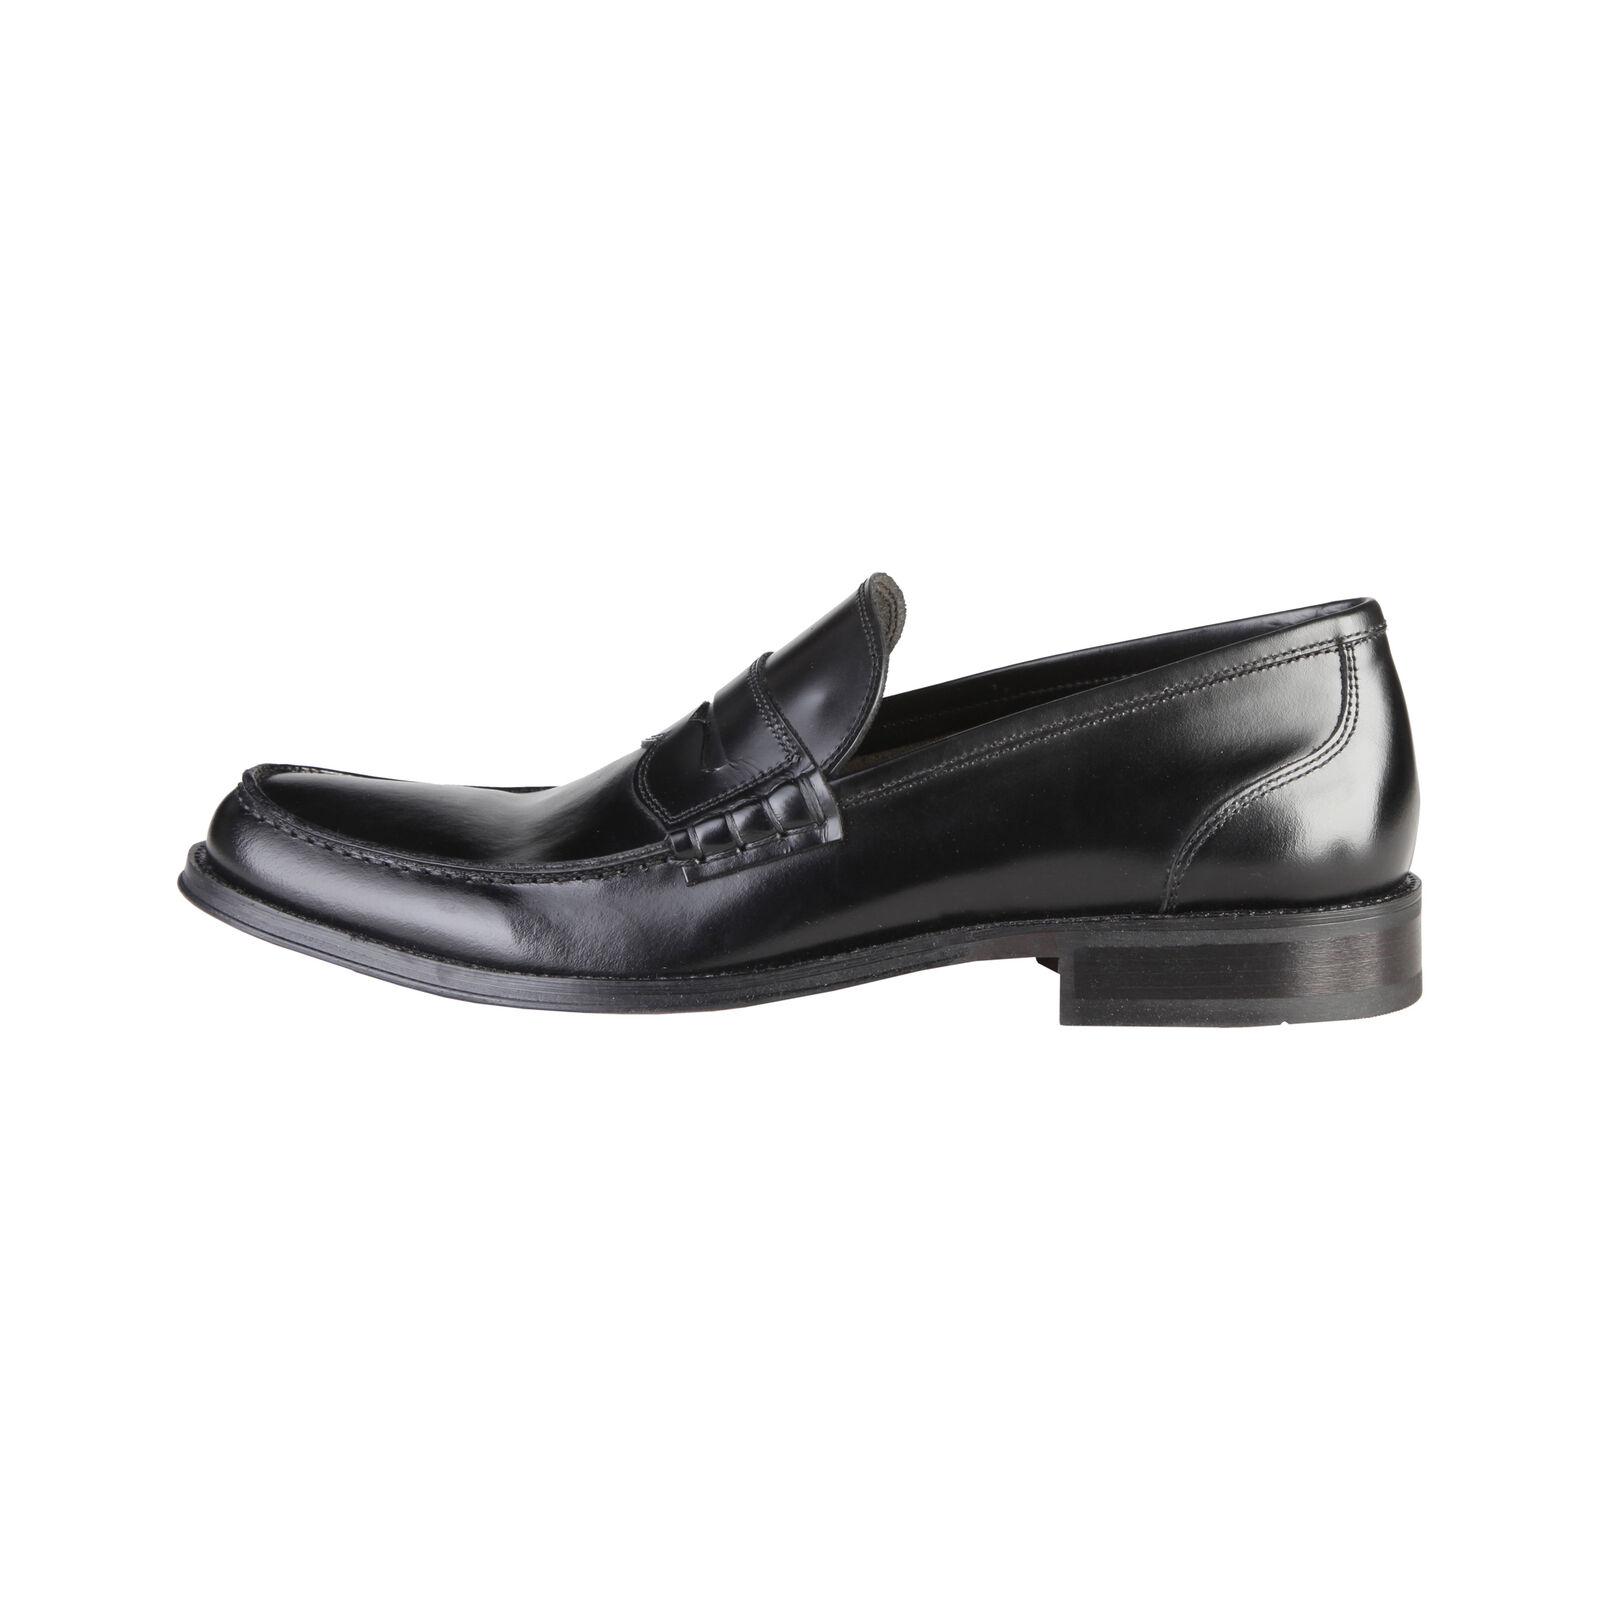 Made in Italia Herren Herren Herren Schuhe Klassische Mokassins Slipper Schwarz Leder | 2019  d9e40d